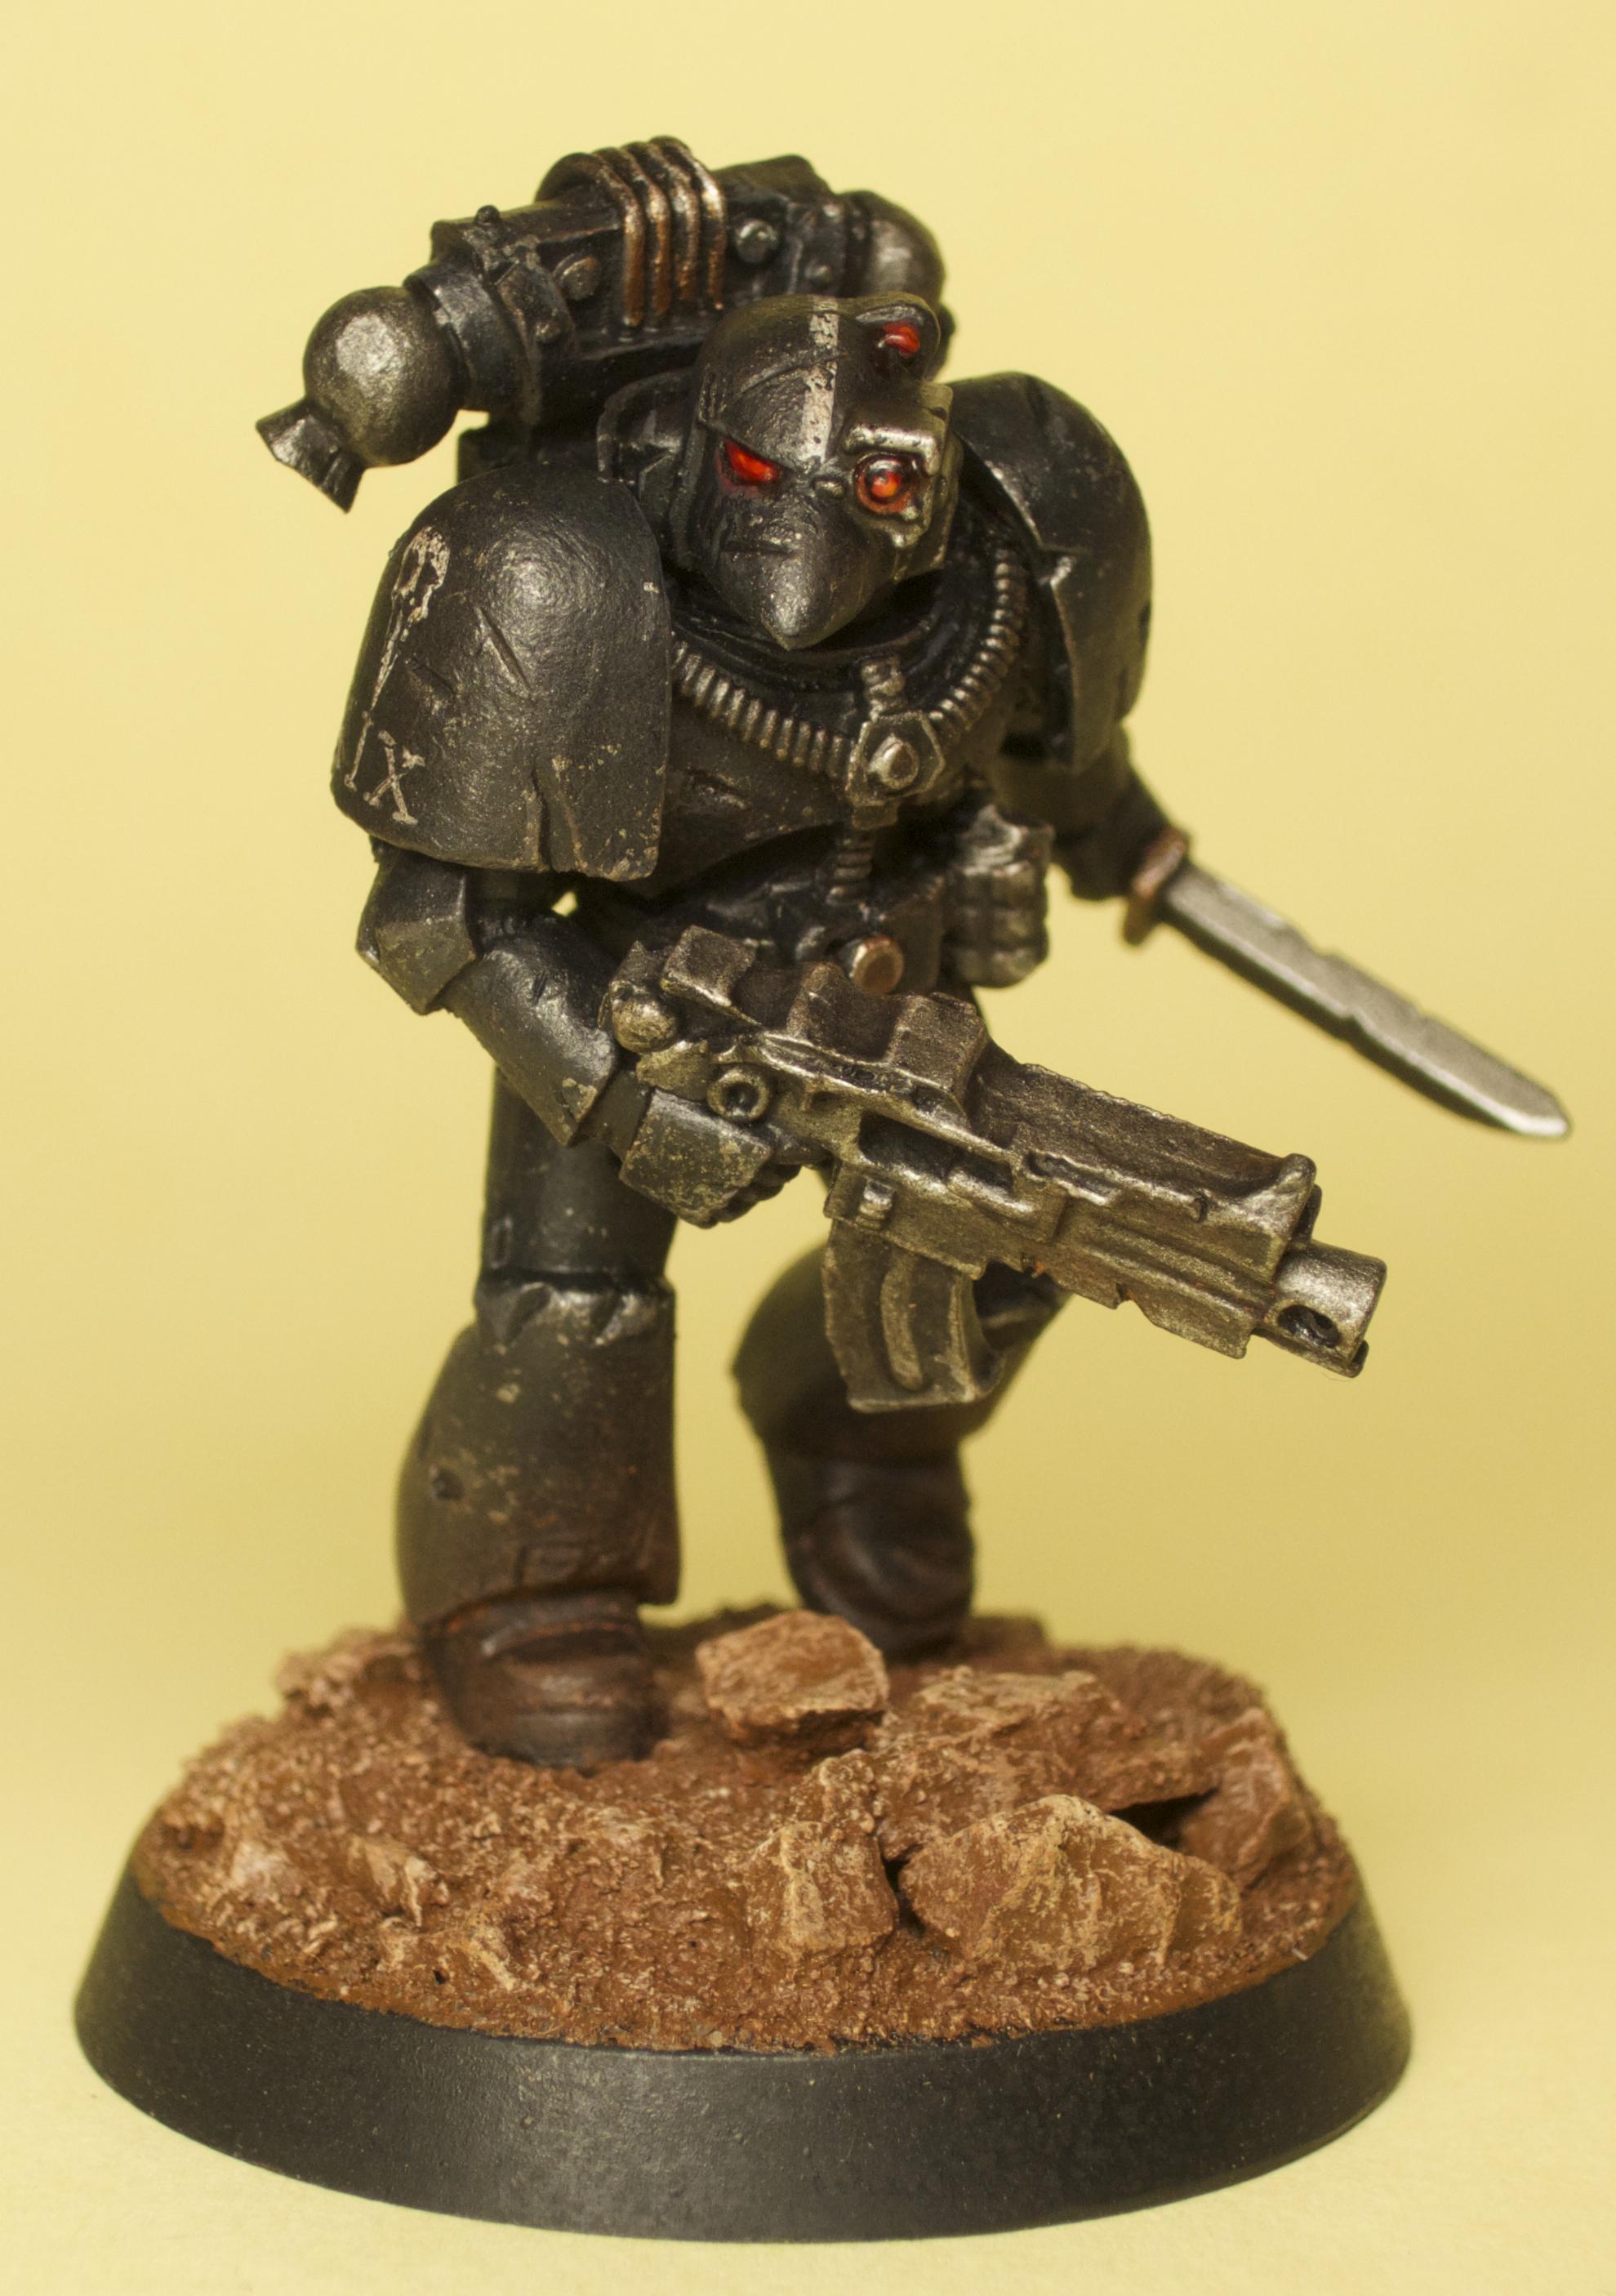 30k, Forge World, Heresy, Legion, Raven Guard, Space Marines, Weathered